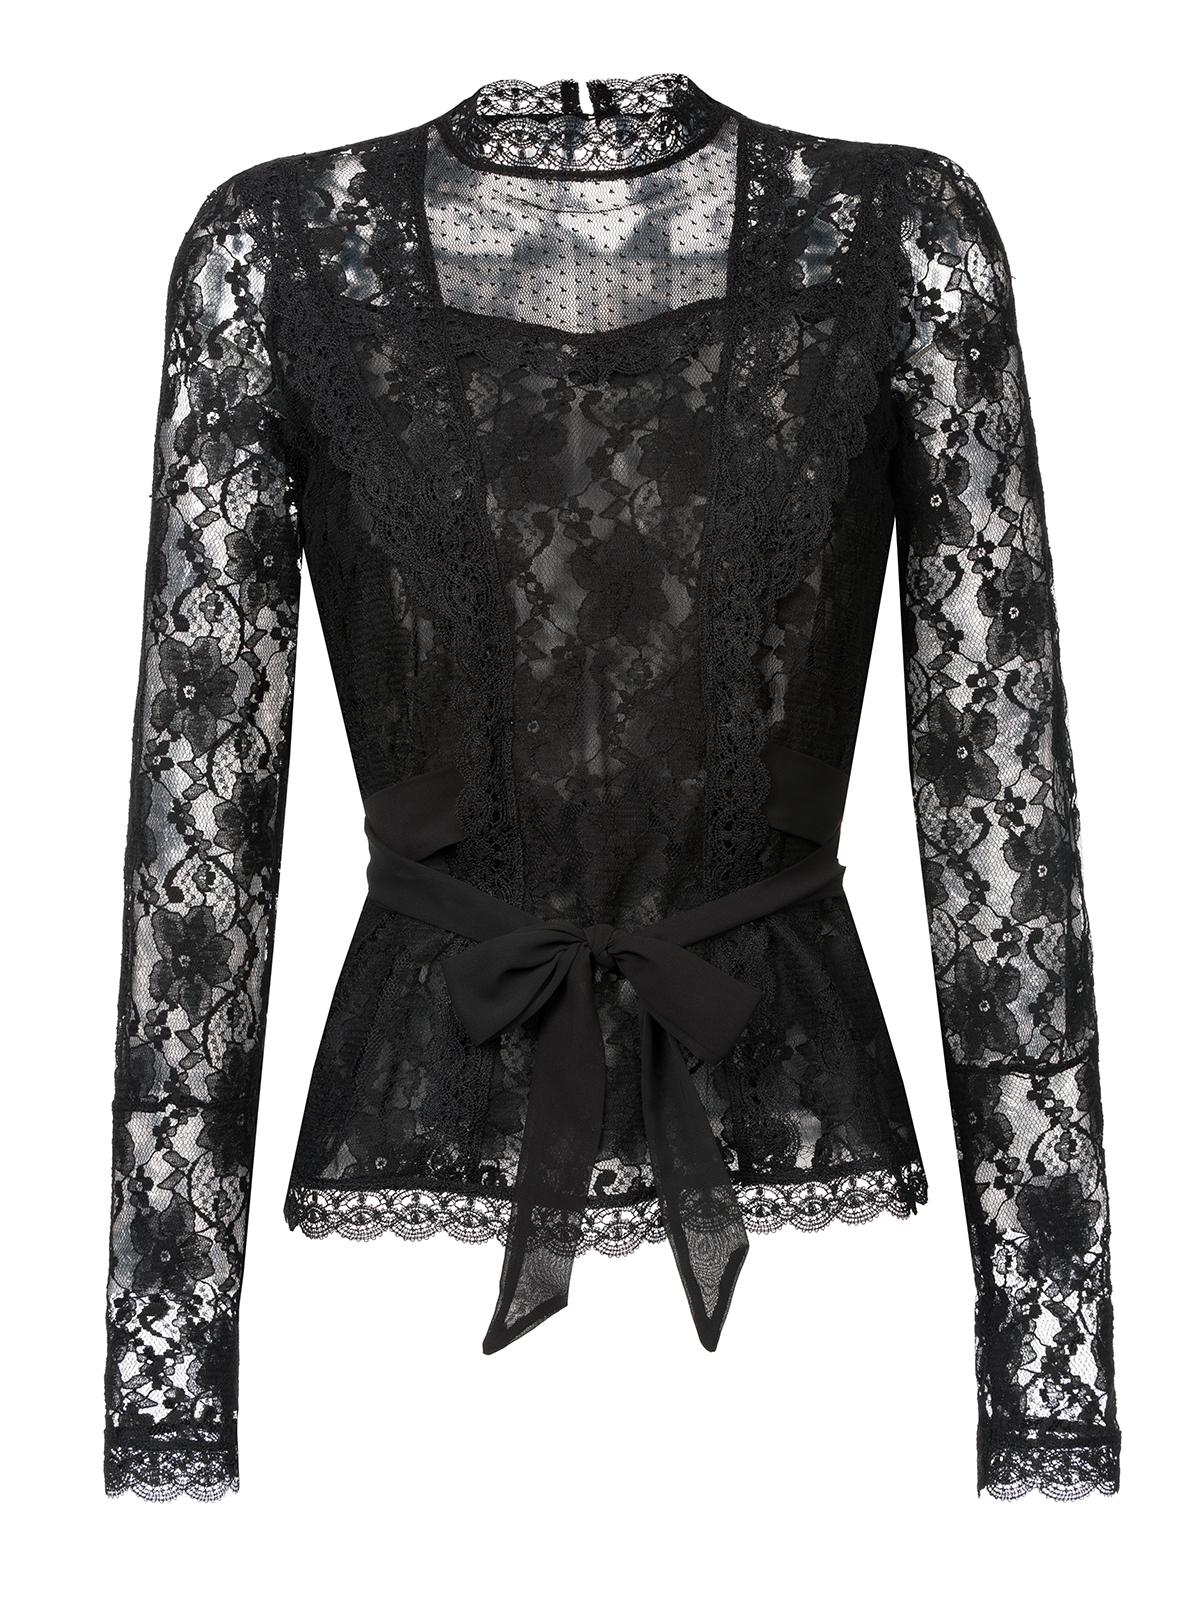 13c1e48f2b52 Vive Maria Dandy In Love Blouse black Clothing Shirts